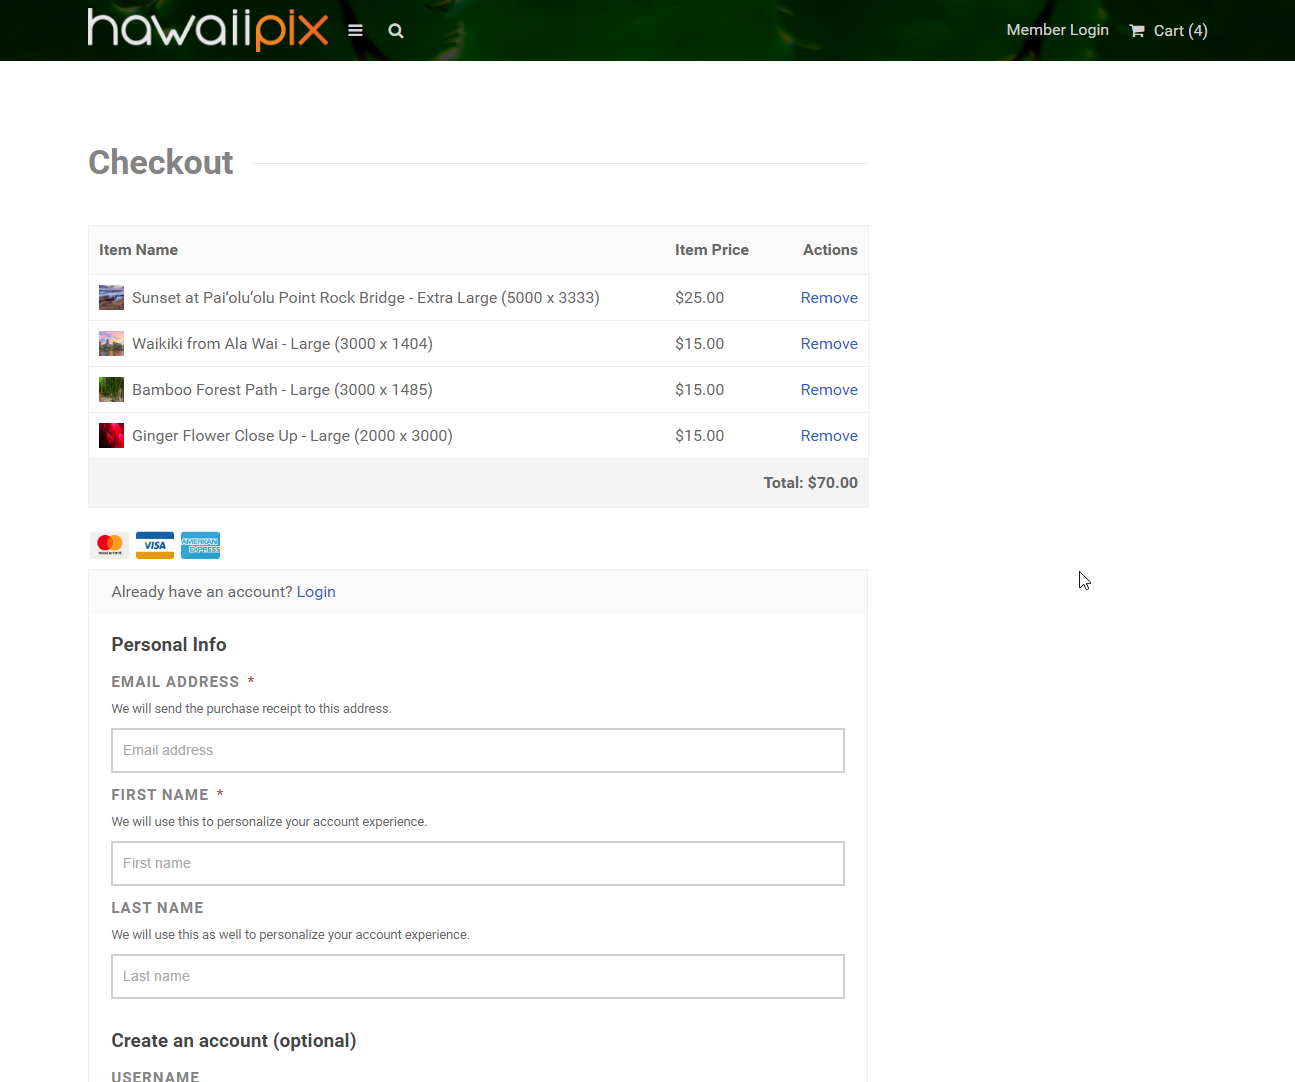 Hawaiipix Checkout Page